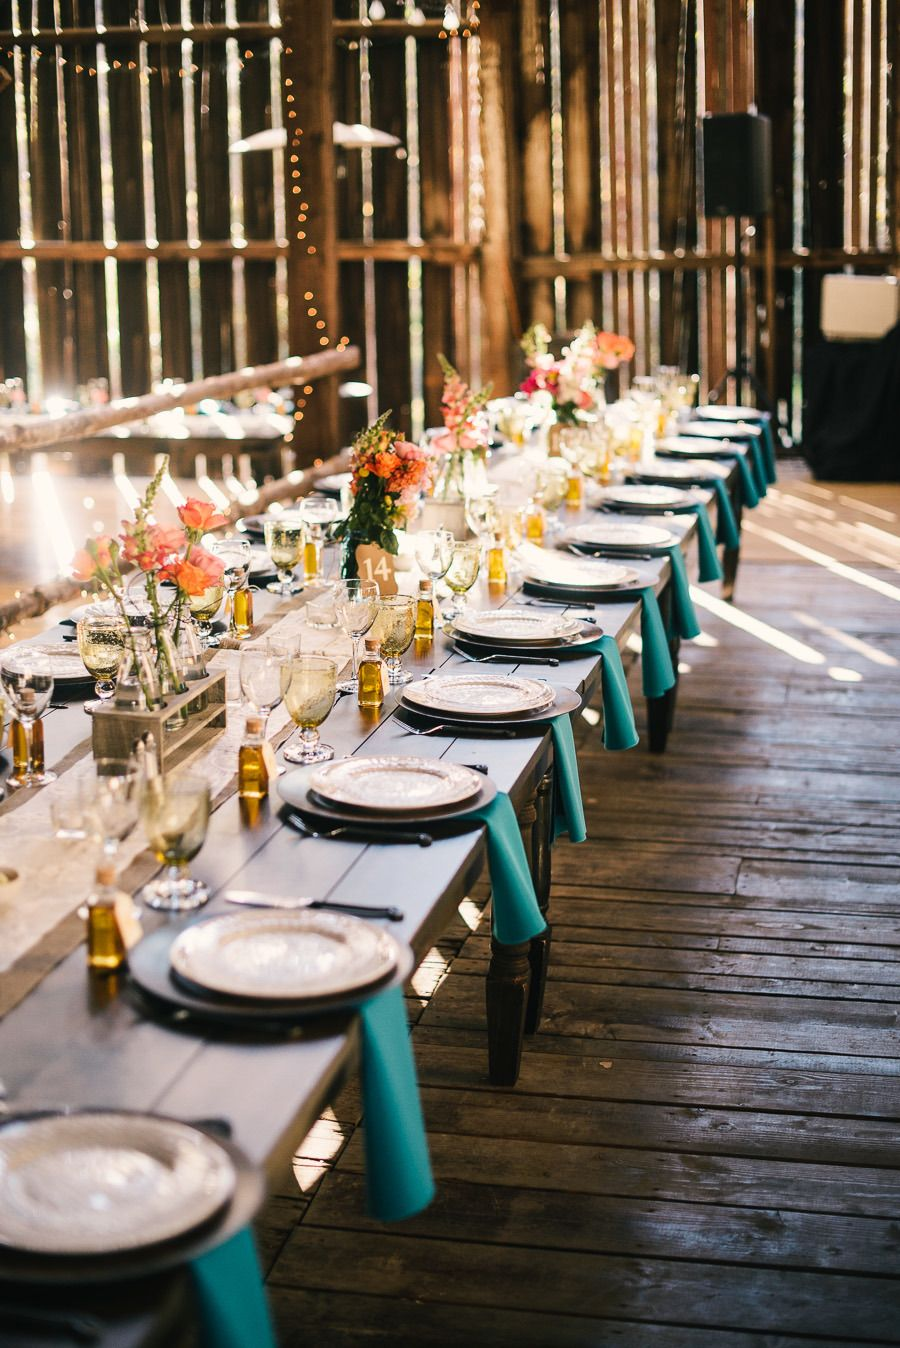 Barn Reception - Bright & Beautiful - Photography:  kenkienow.com on #SMP. See the wedding here: http://www.StyleMePretty.com/california-weddings/sacramento/2014/03/29/colorful-squirrel-creek-ranch-wedding/